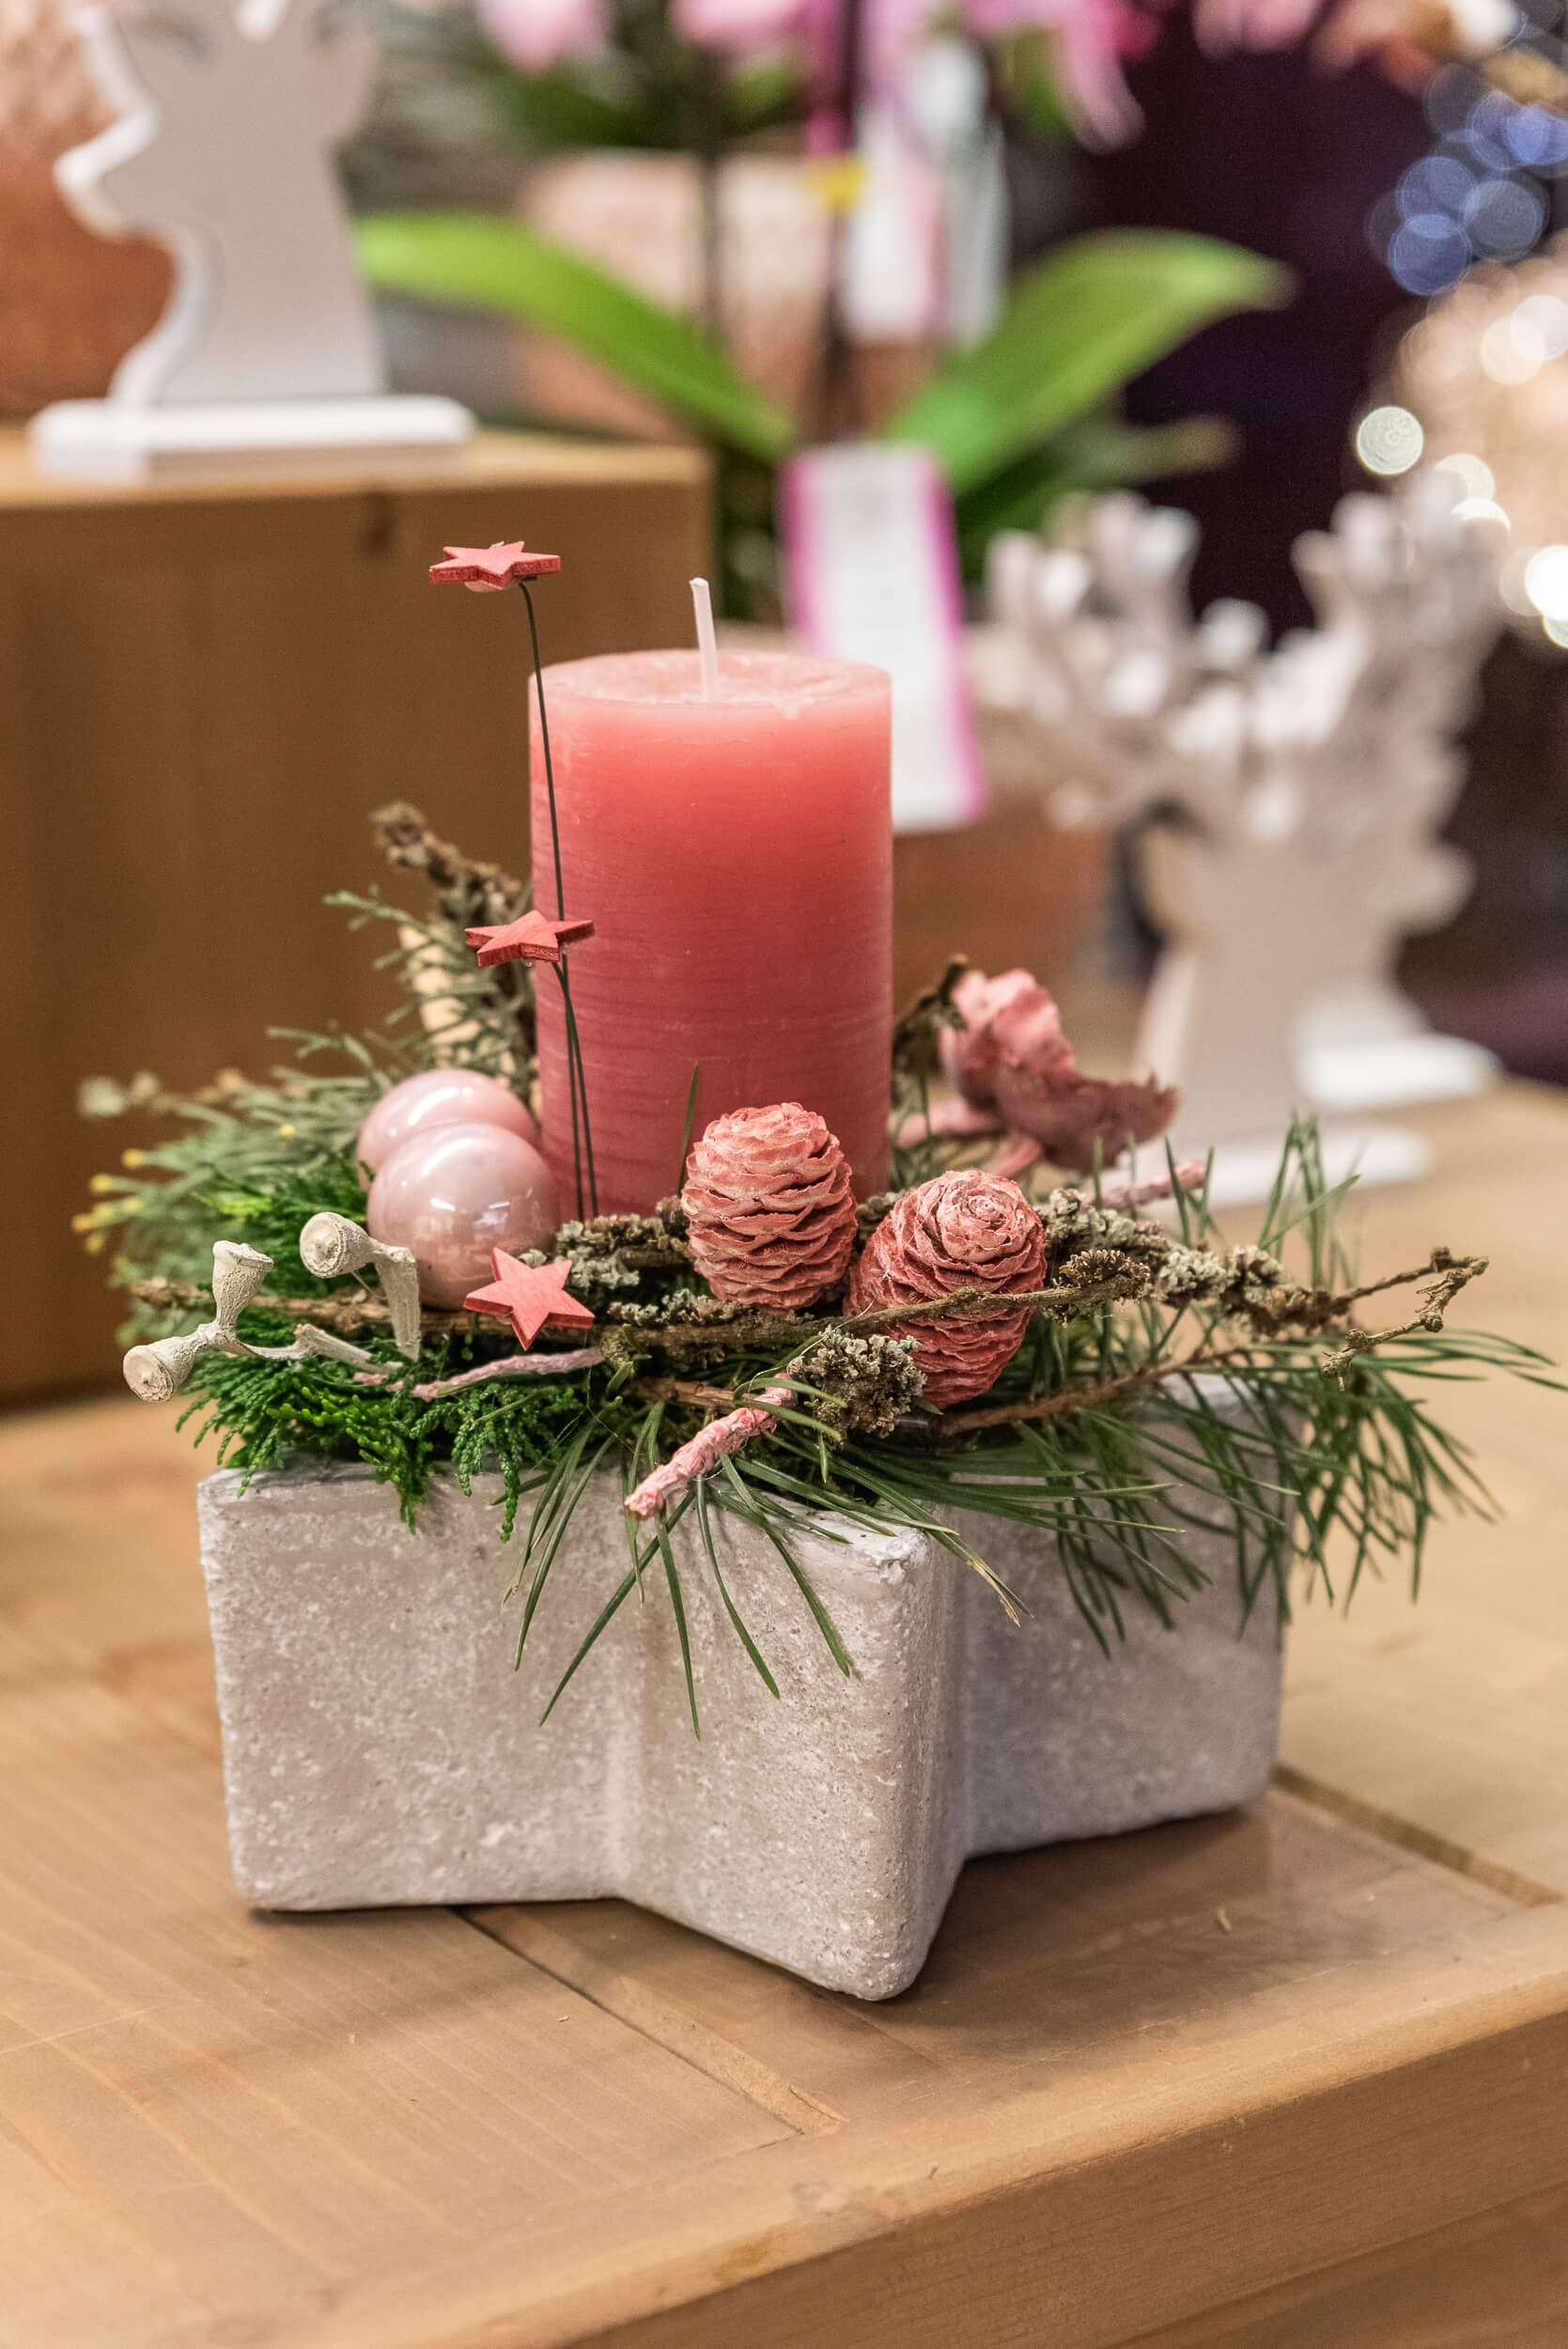 Adventsgesteck mit korallfarbener Kerze